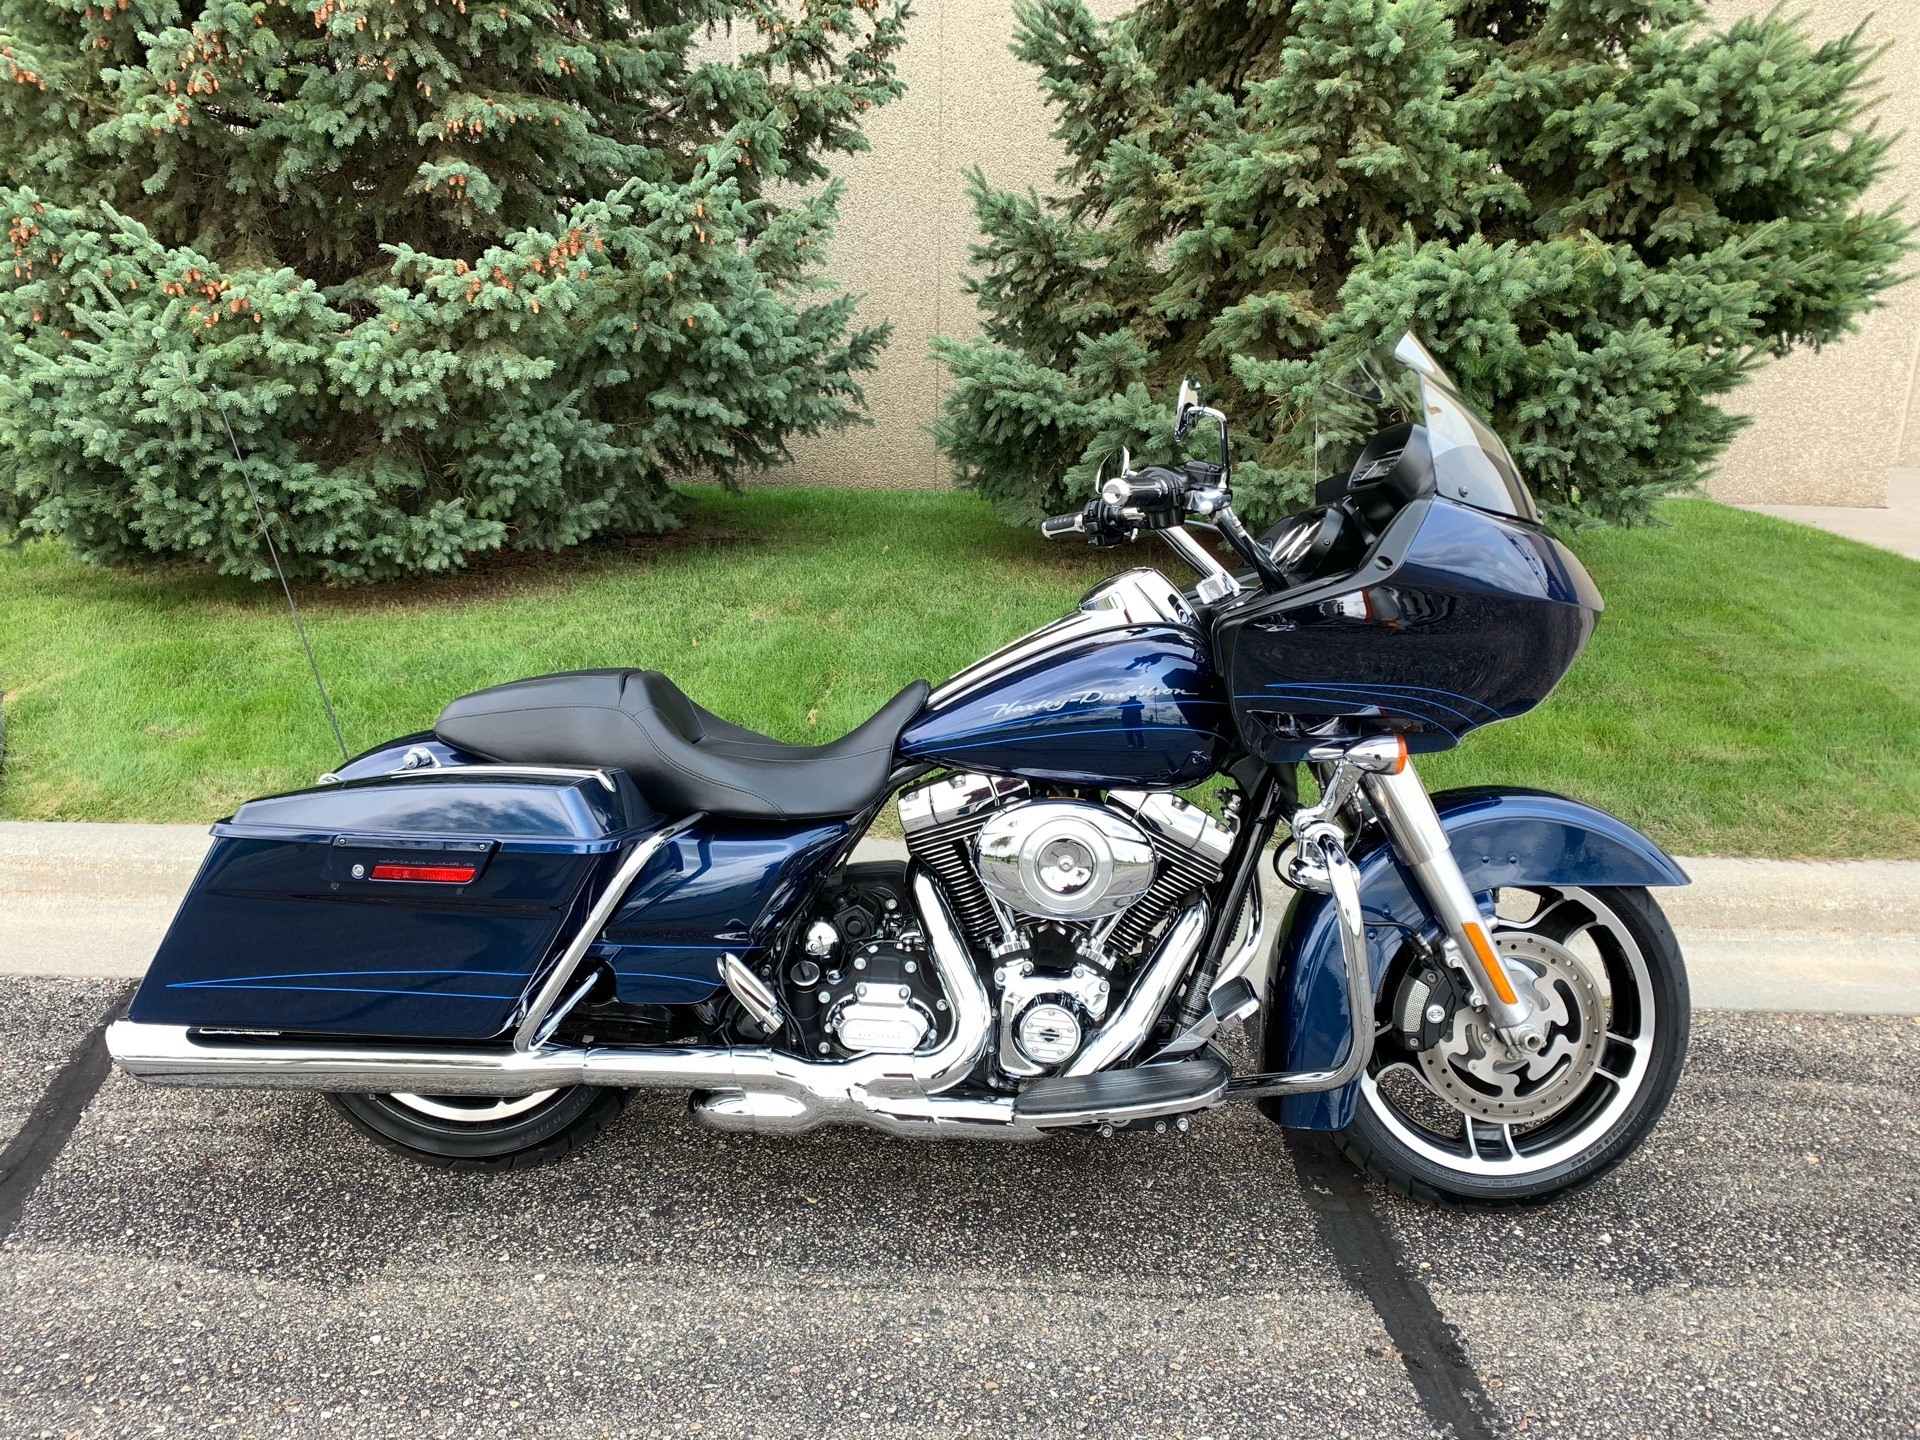 Used 2012 Harley Davidson Road Glide Custom Big Blue Pearl Motorcycles In Alexandria Mn A638060